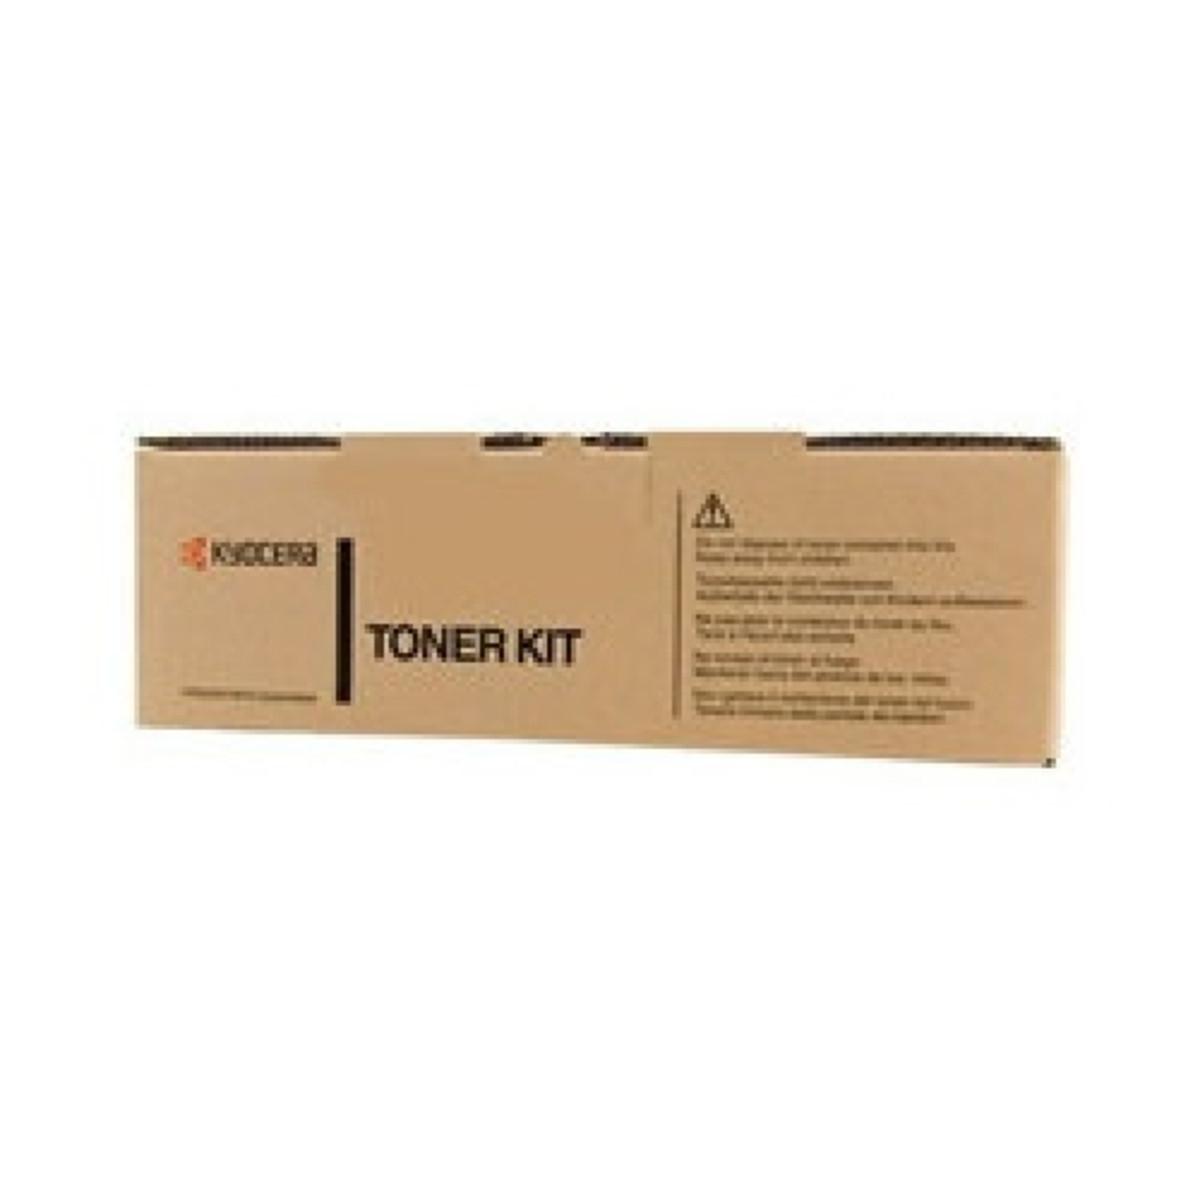 Kyocera TK-3134 Black Toner Cartridge